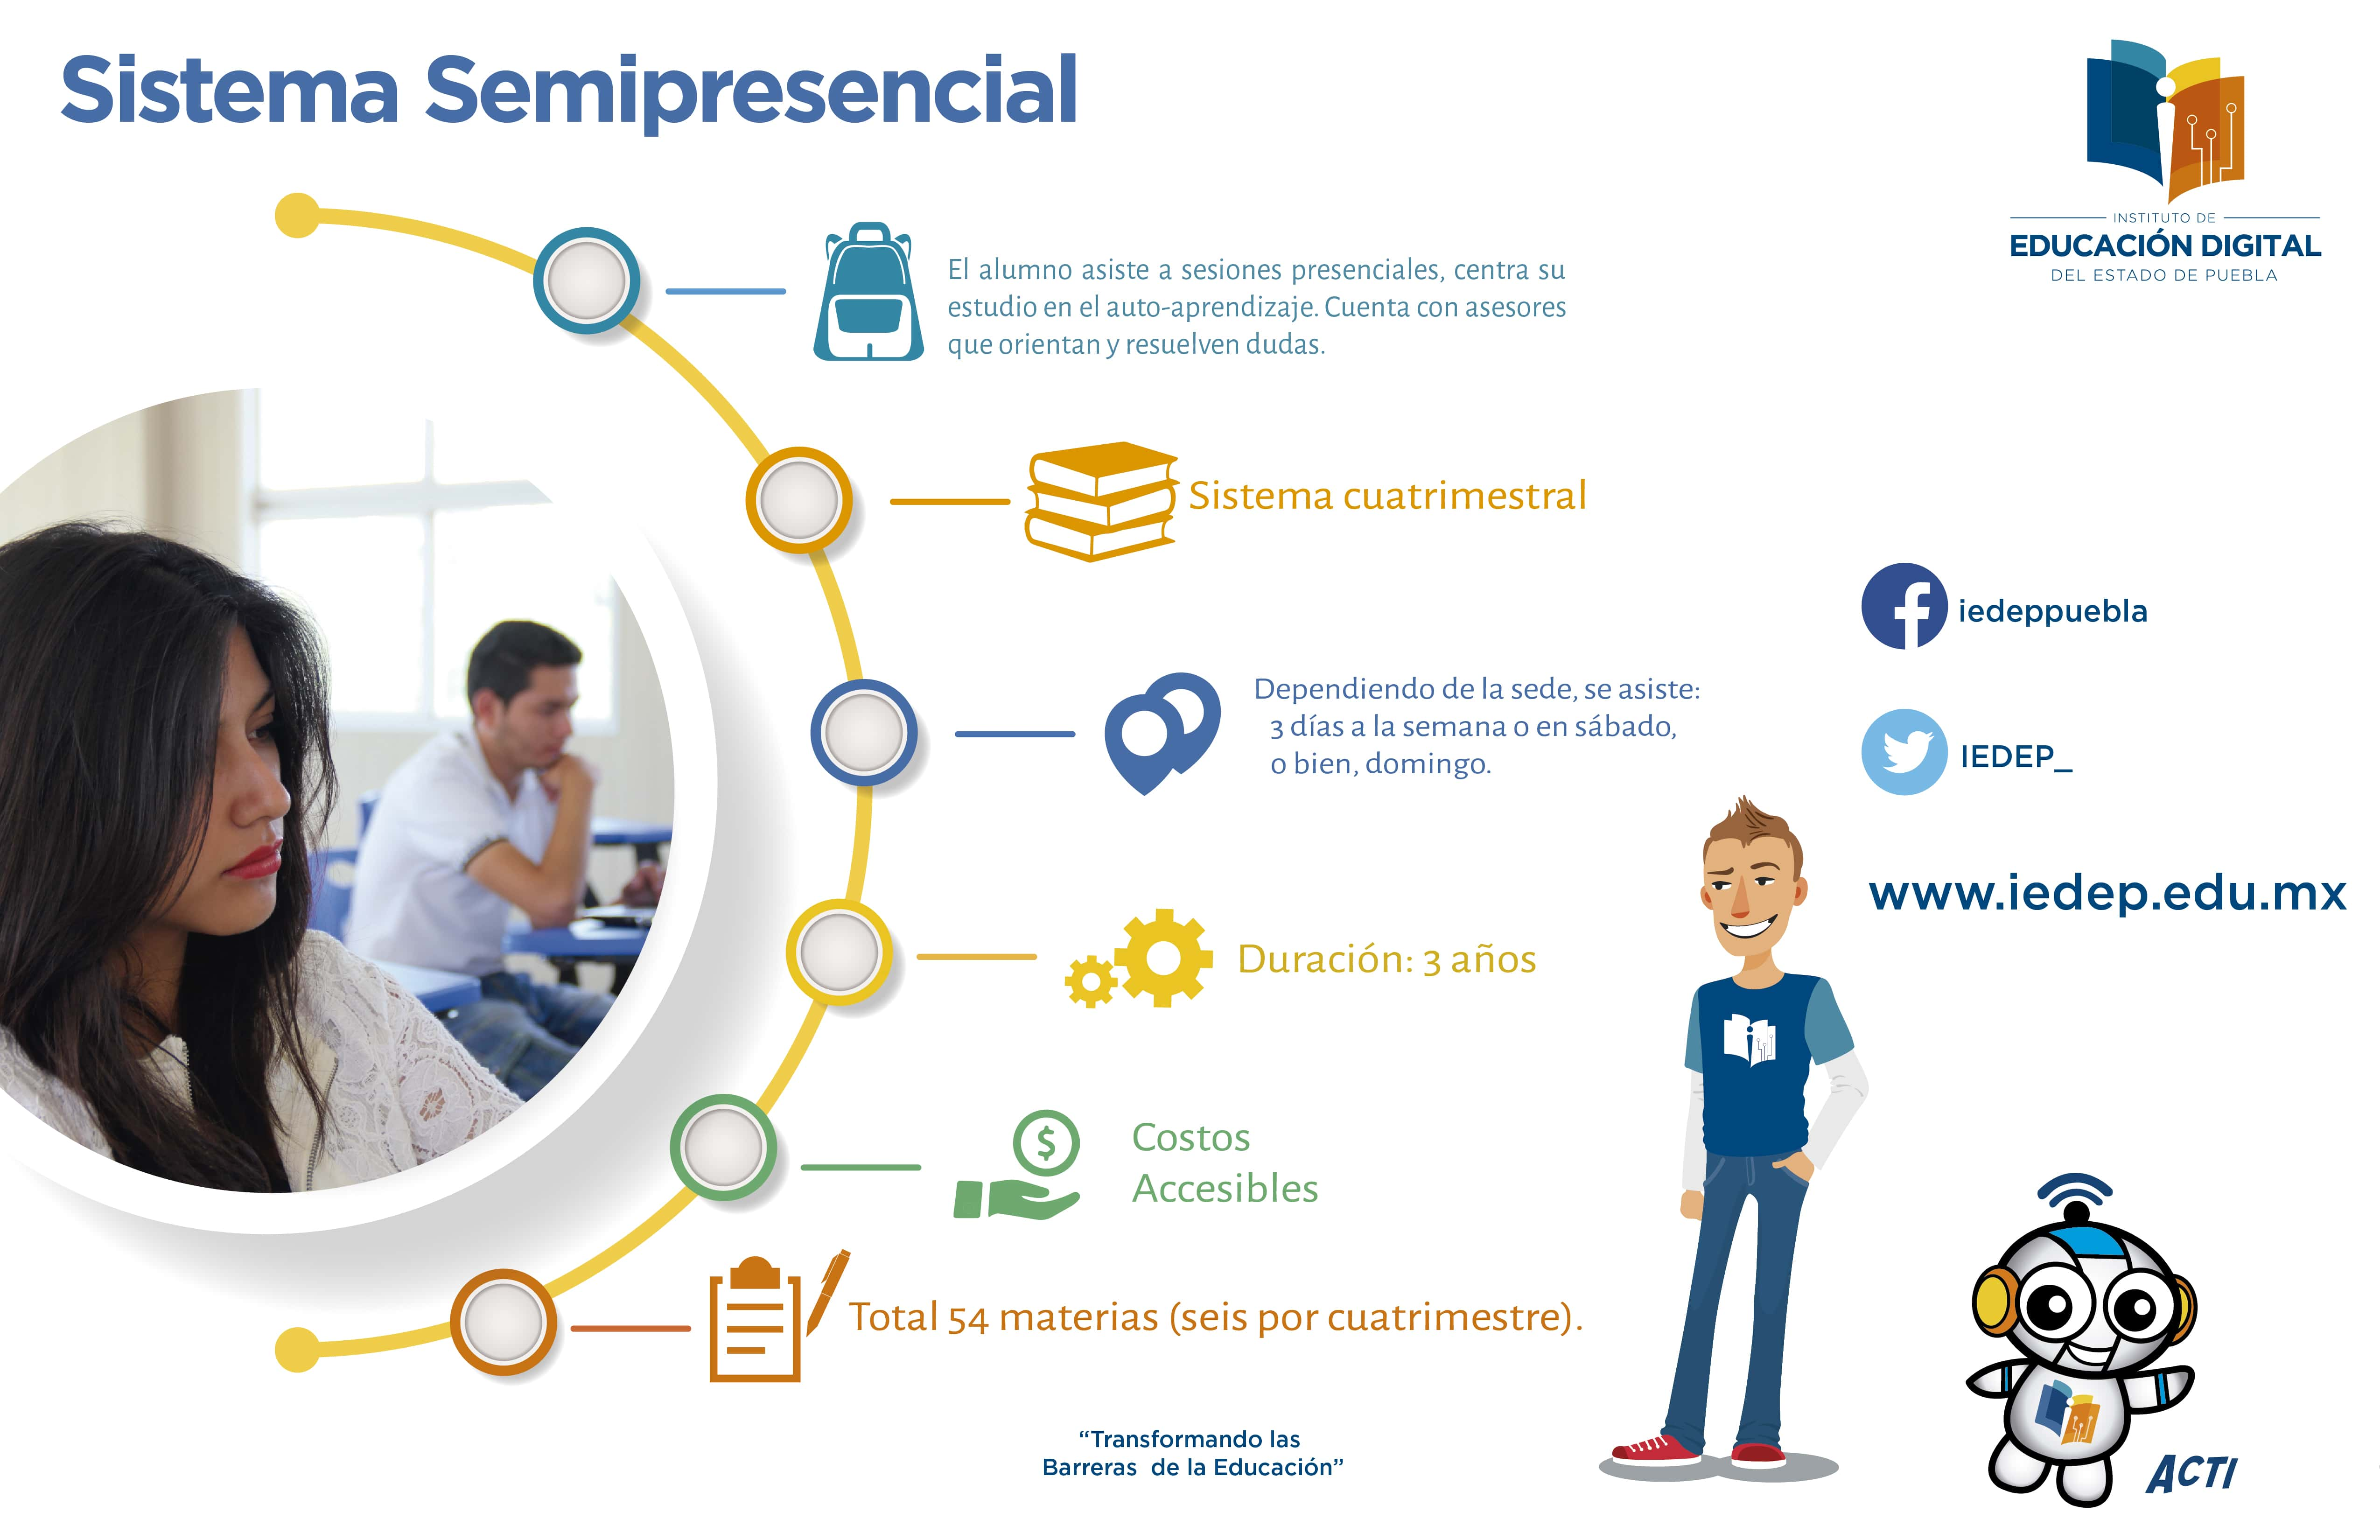 Sistema Semipresencial